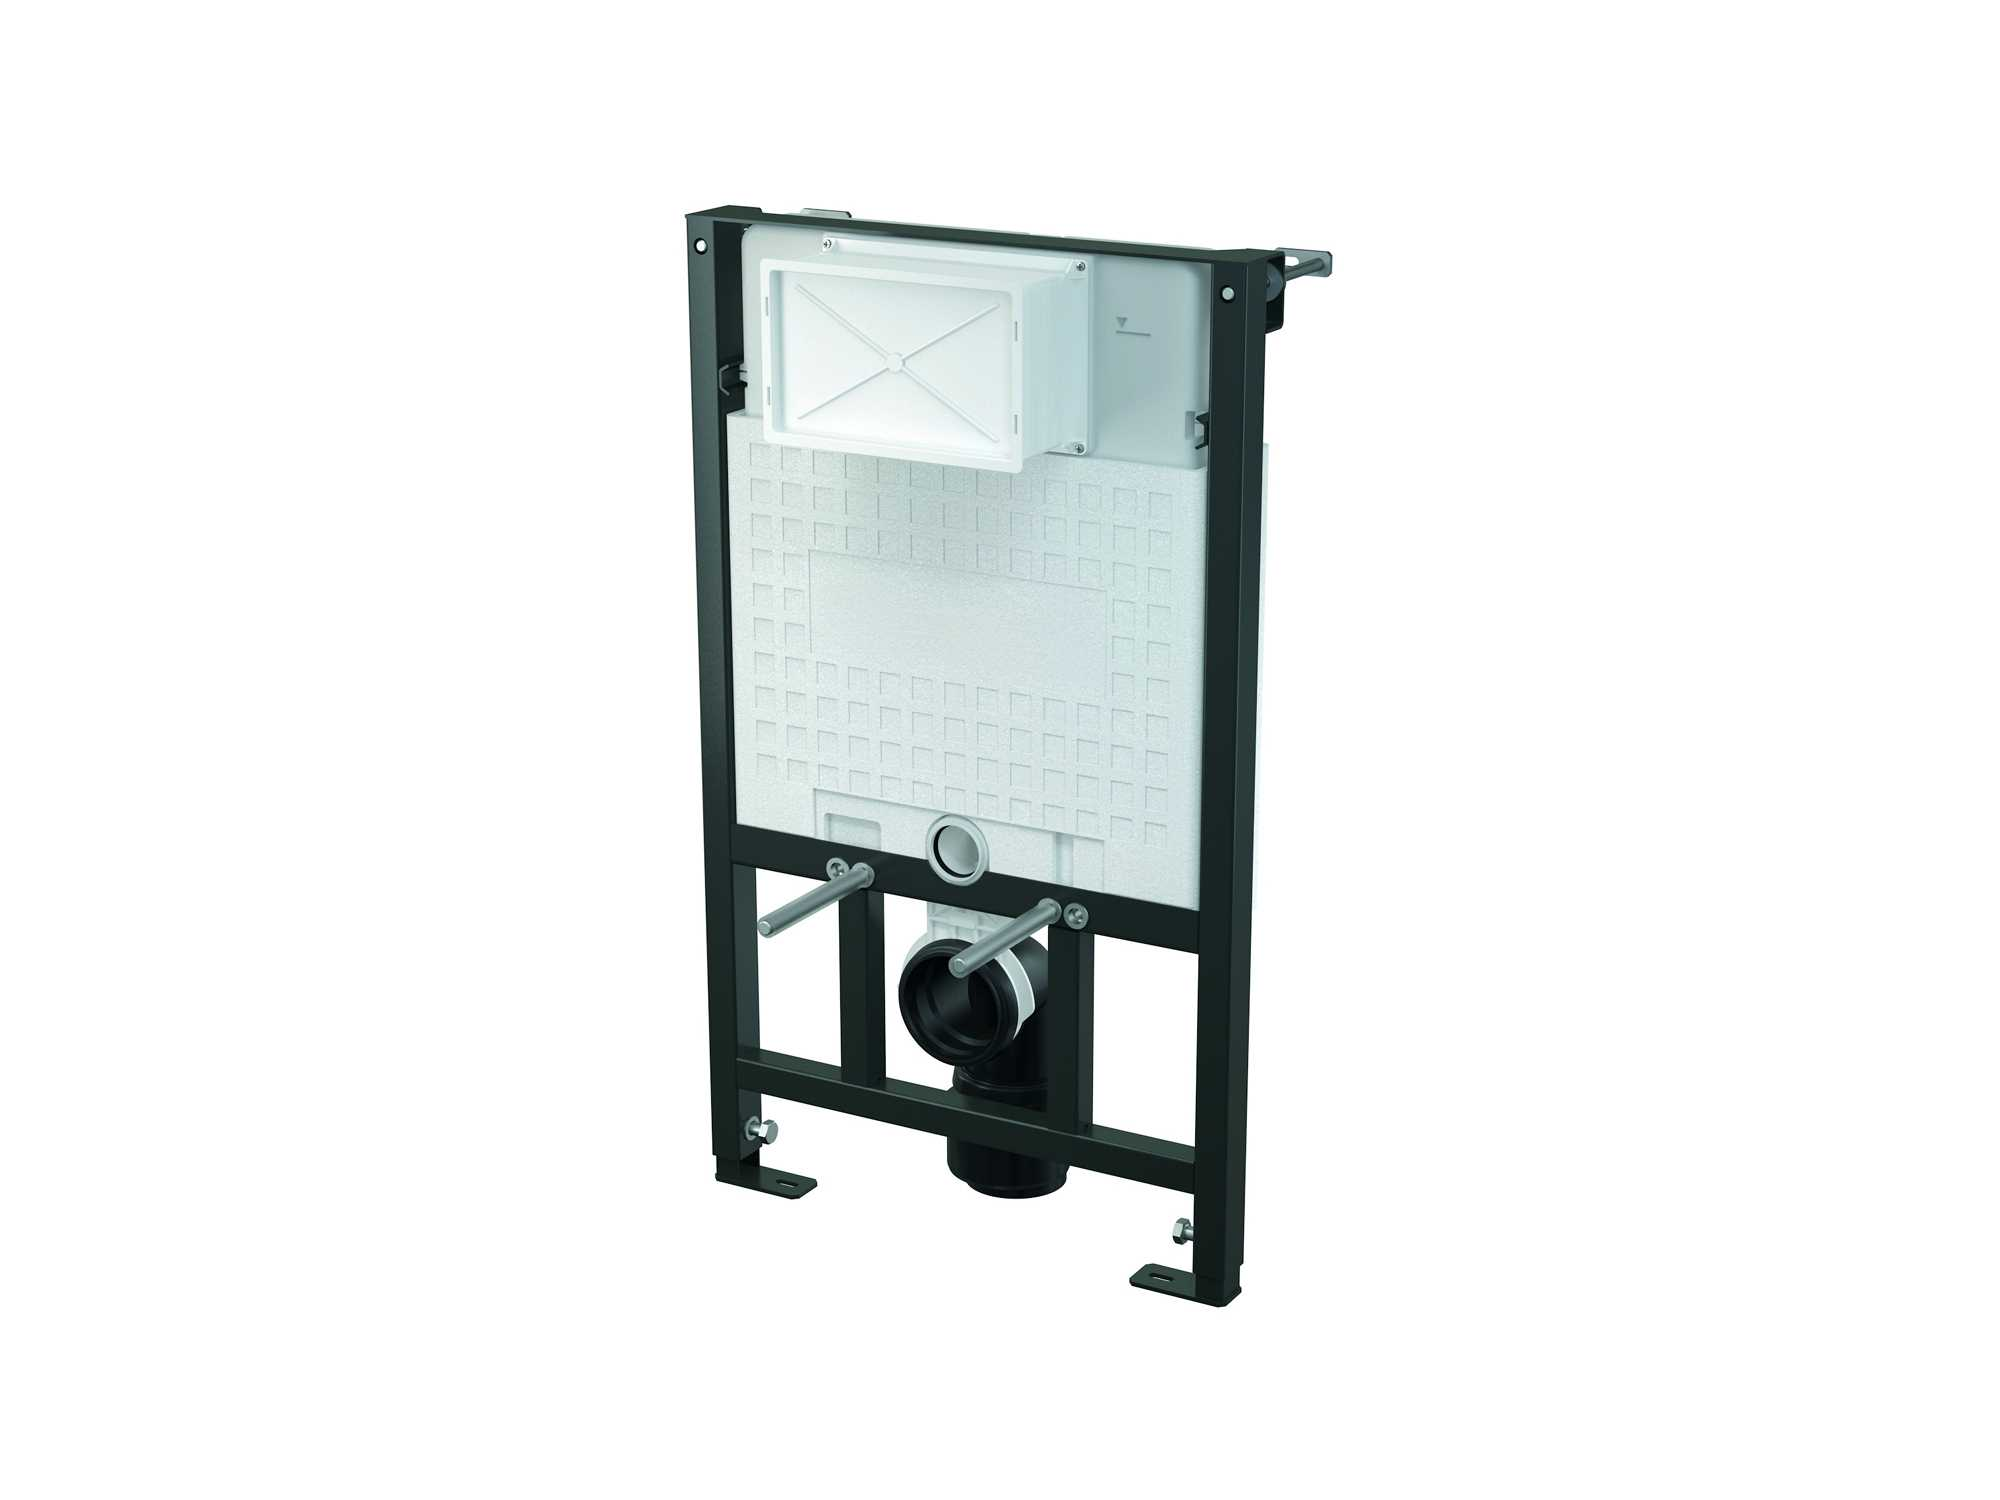 wc vorwandelement inkl premium dr ckerplatte zur wandmontage unterputzsp lkasten h nge wc. Black Bedroom Furniture Sets. Home Design Ideas